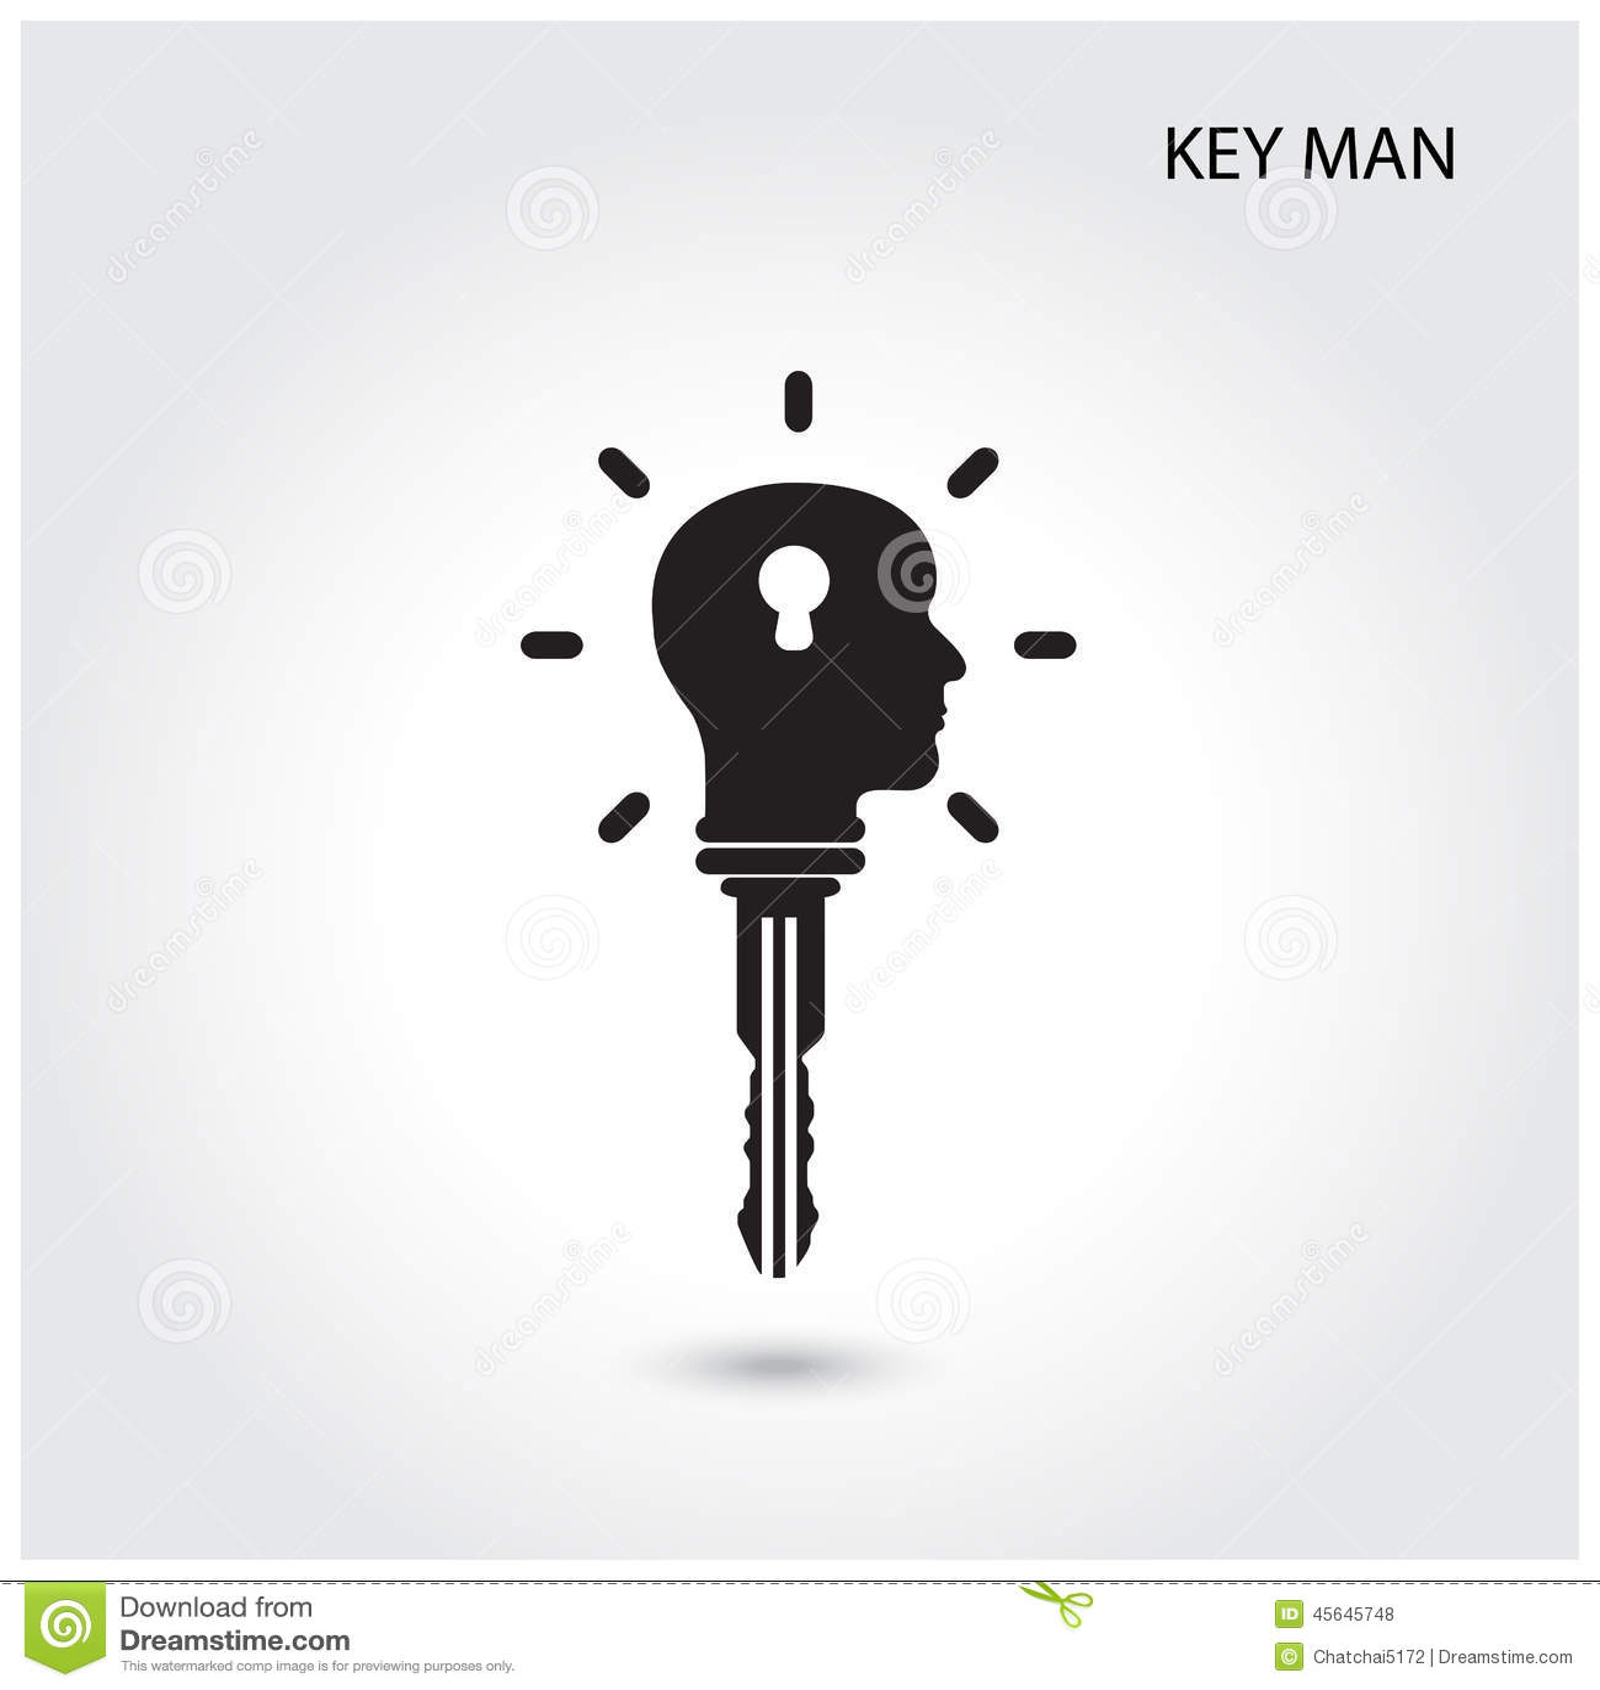 Creative silhouette head idea concept with key symbol